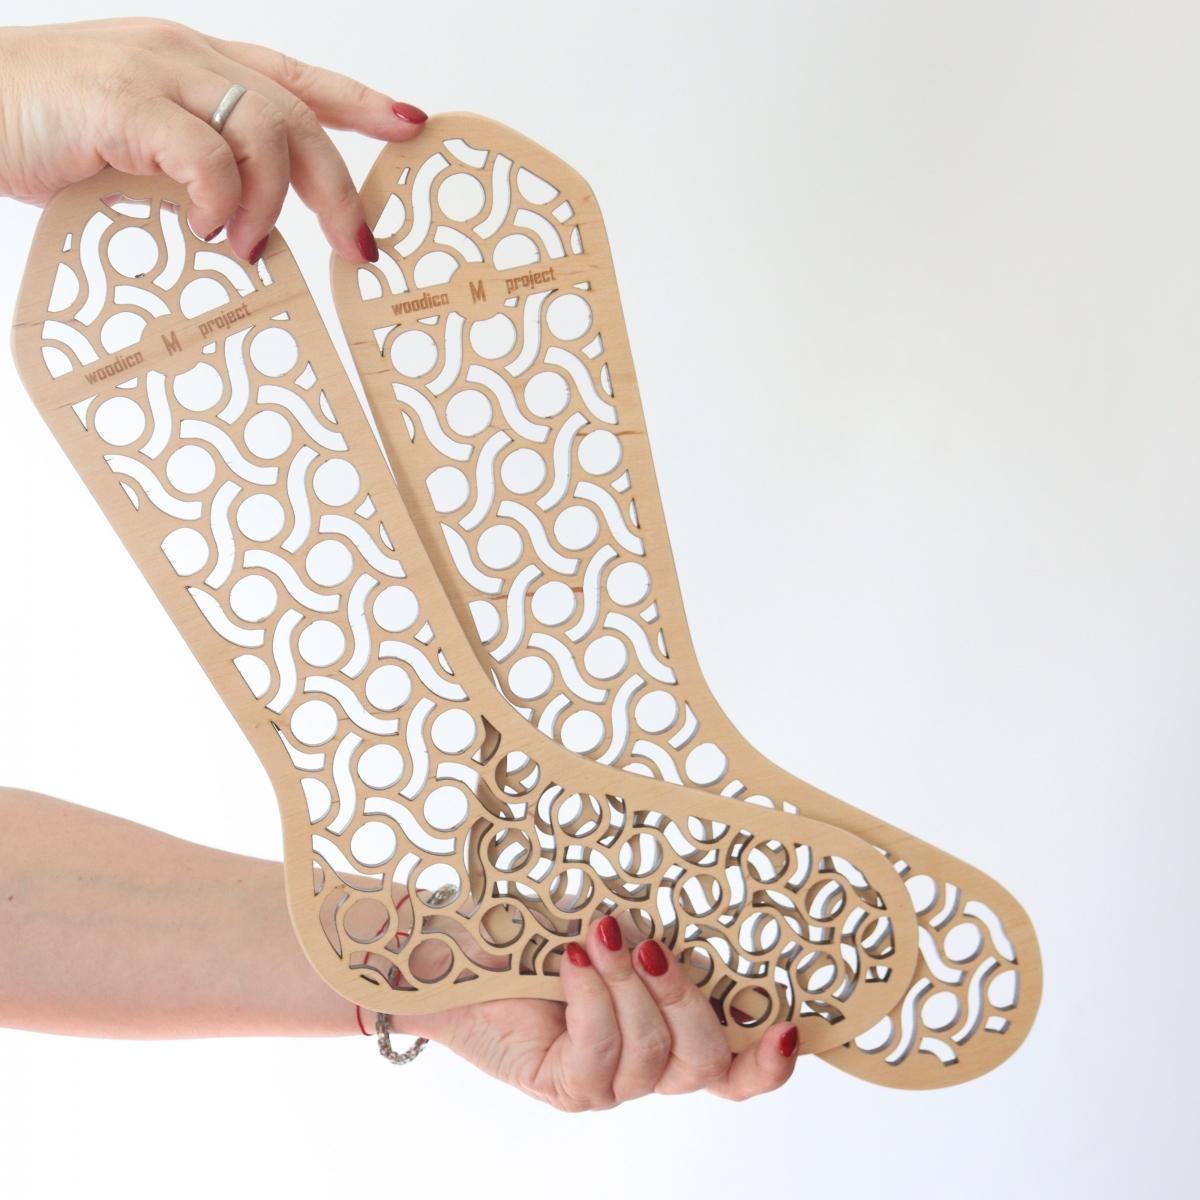 woodico.pro wooden sock blockers pasta 7 1200x1200 - Wooden sock blockers / Pasta